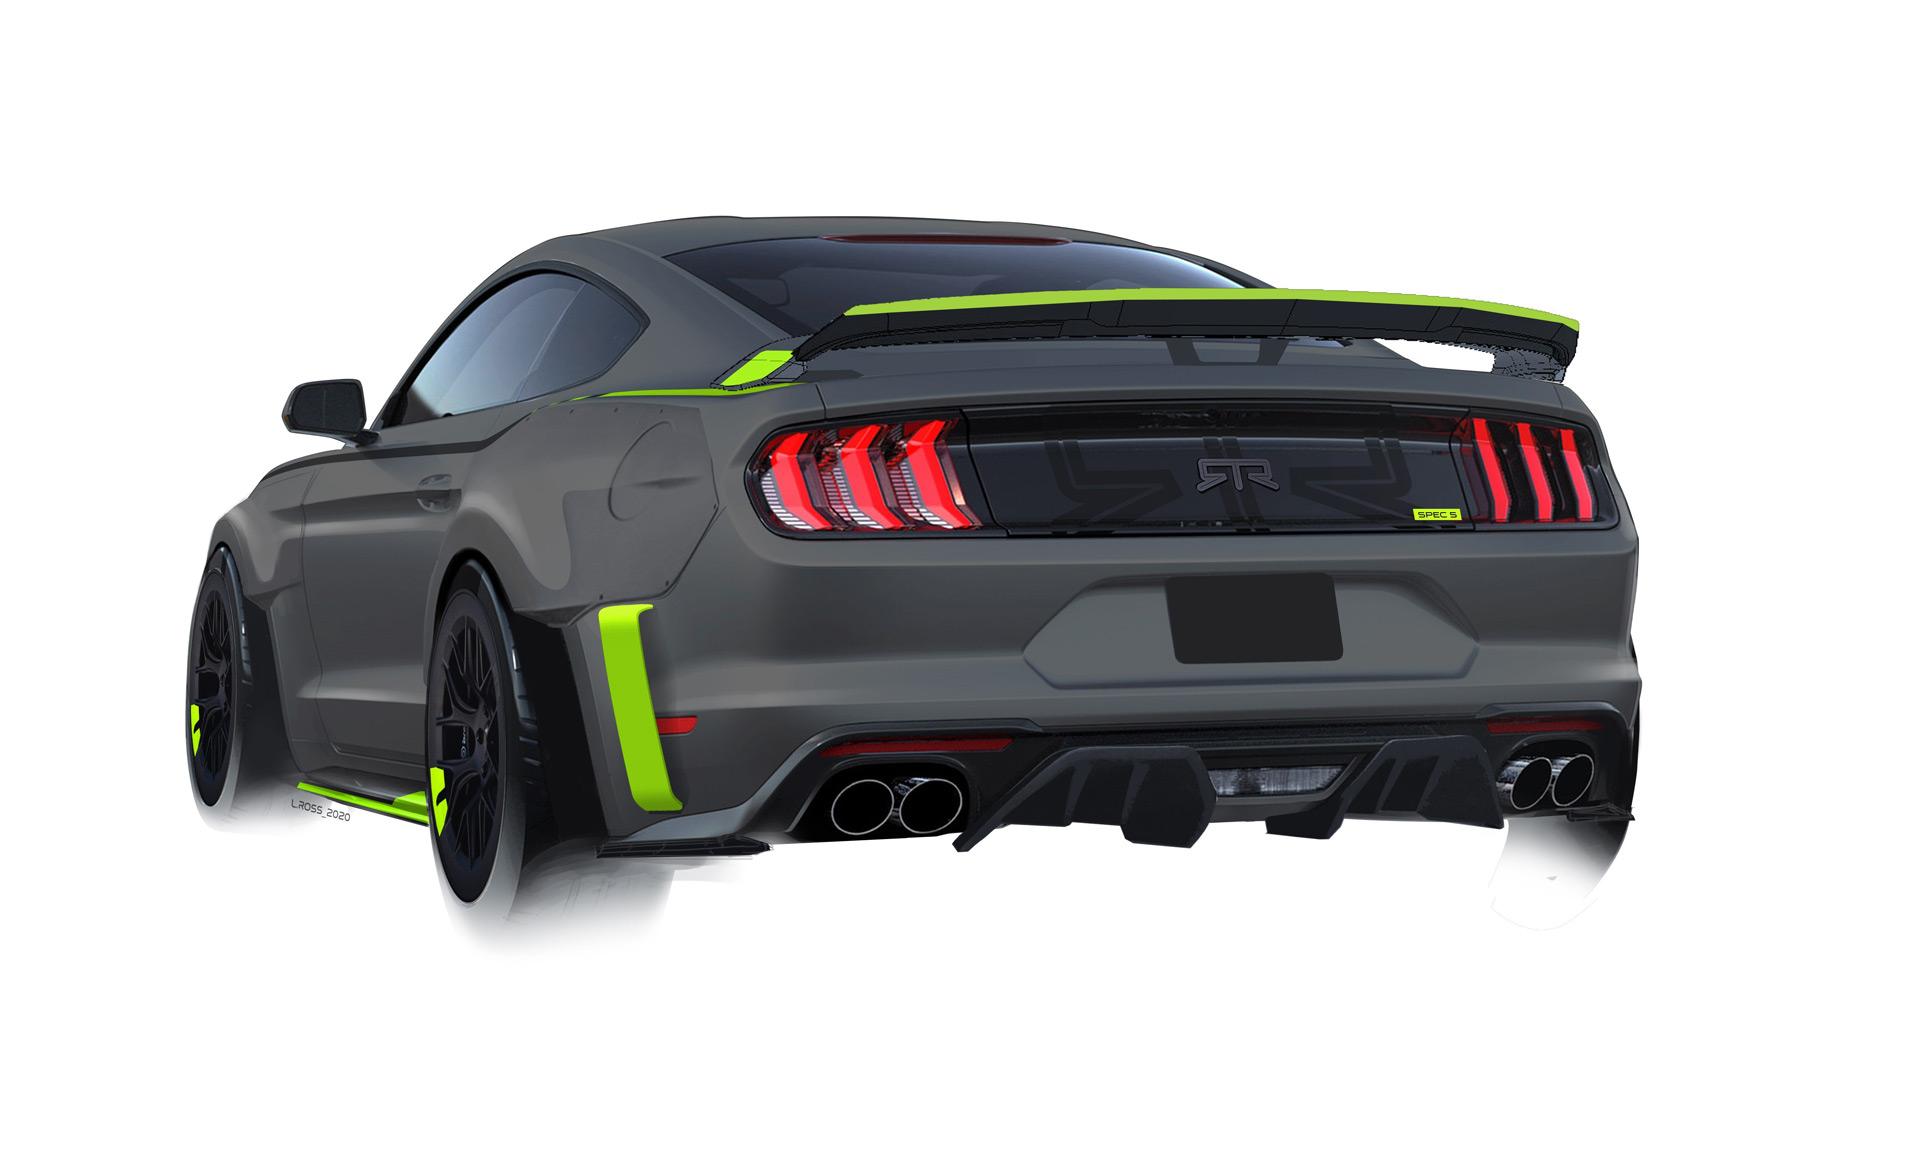 RTR 10th anniversary Mustang, Aston Martin's new investor, Porsche mulls LMDh: Car News Headlines